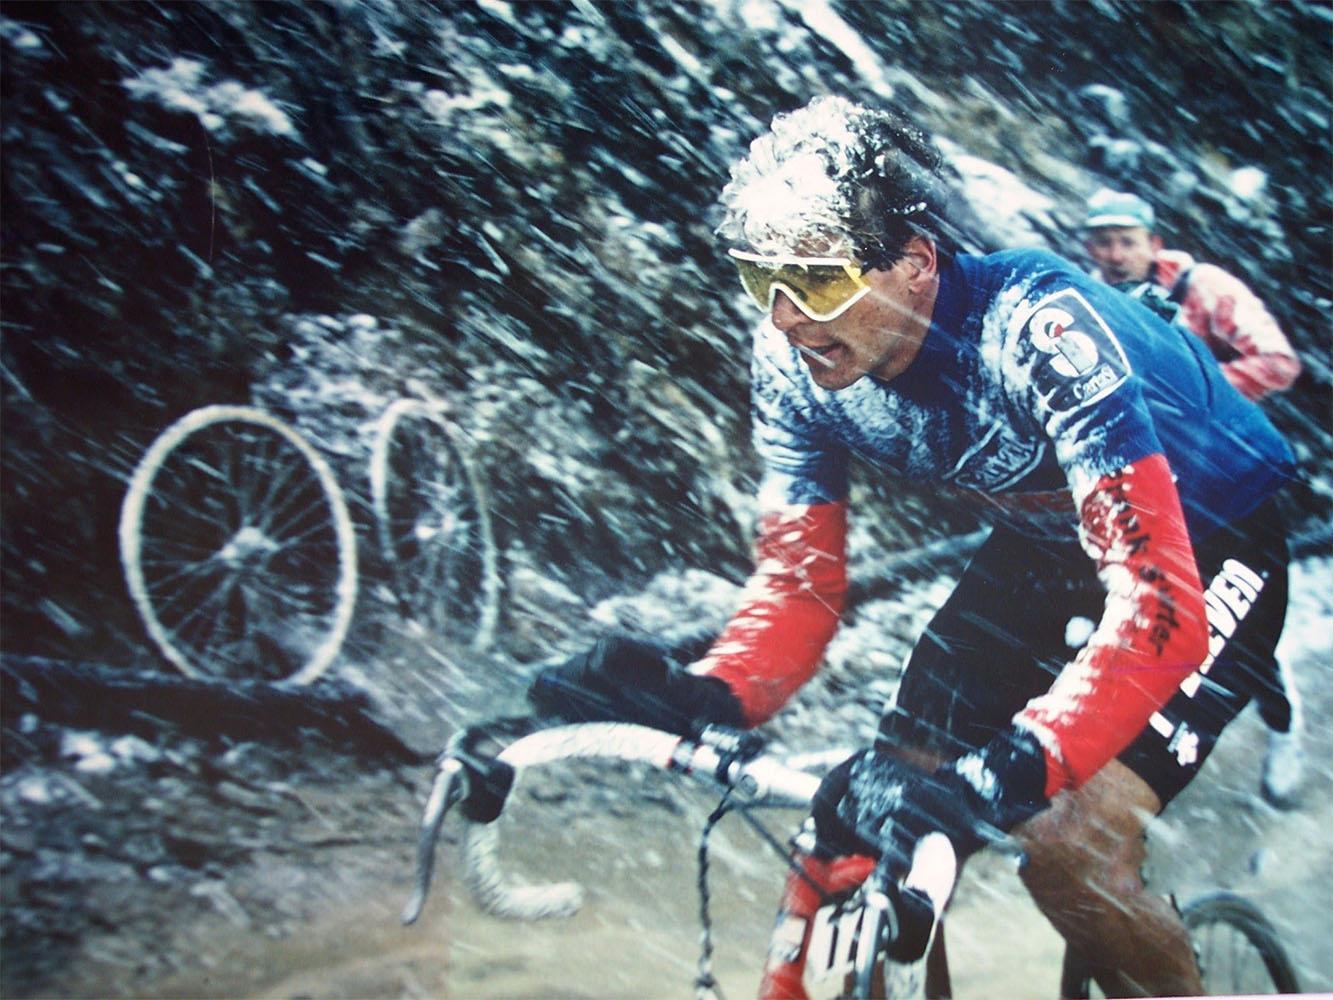 Andrew Hampsten Passo Gavia 1988